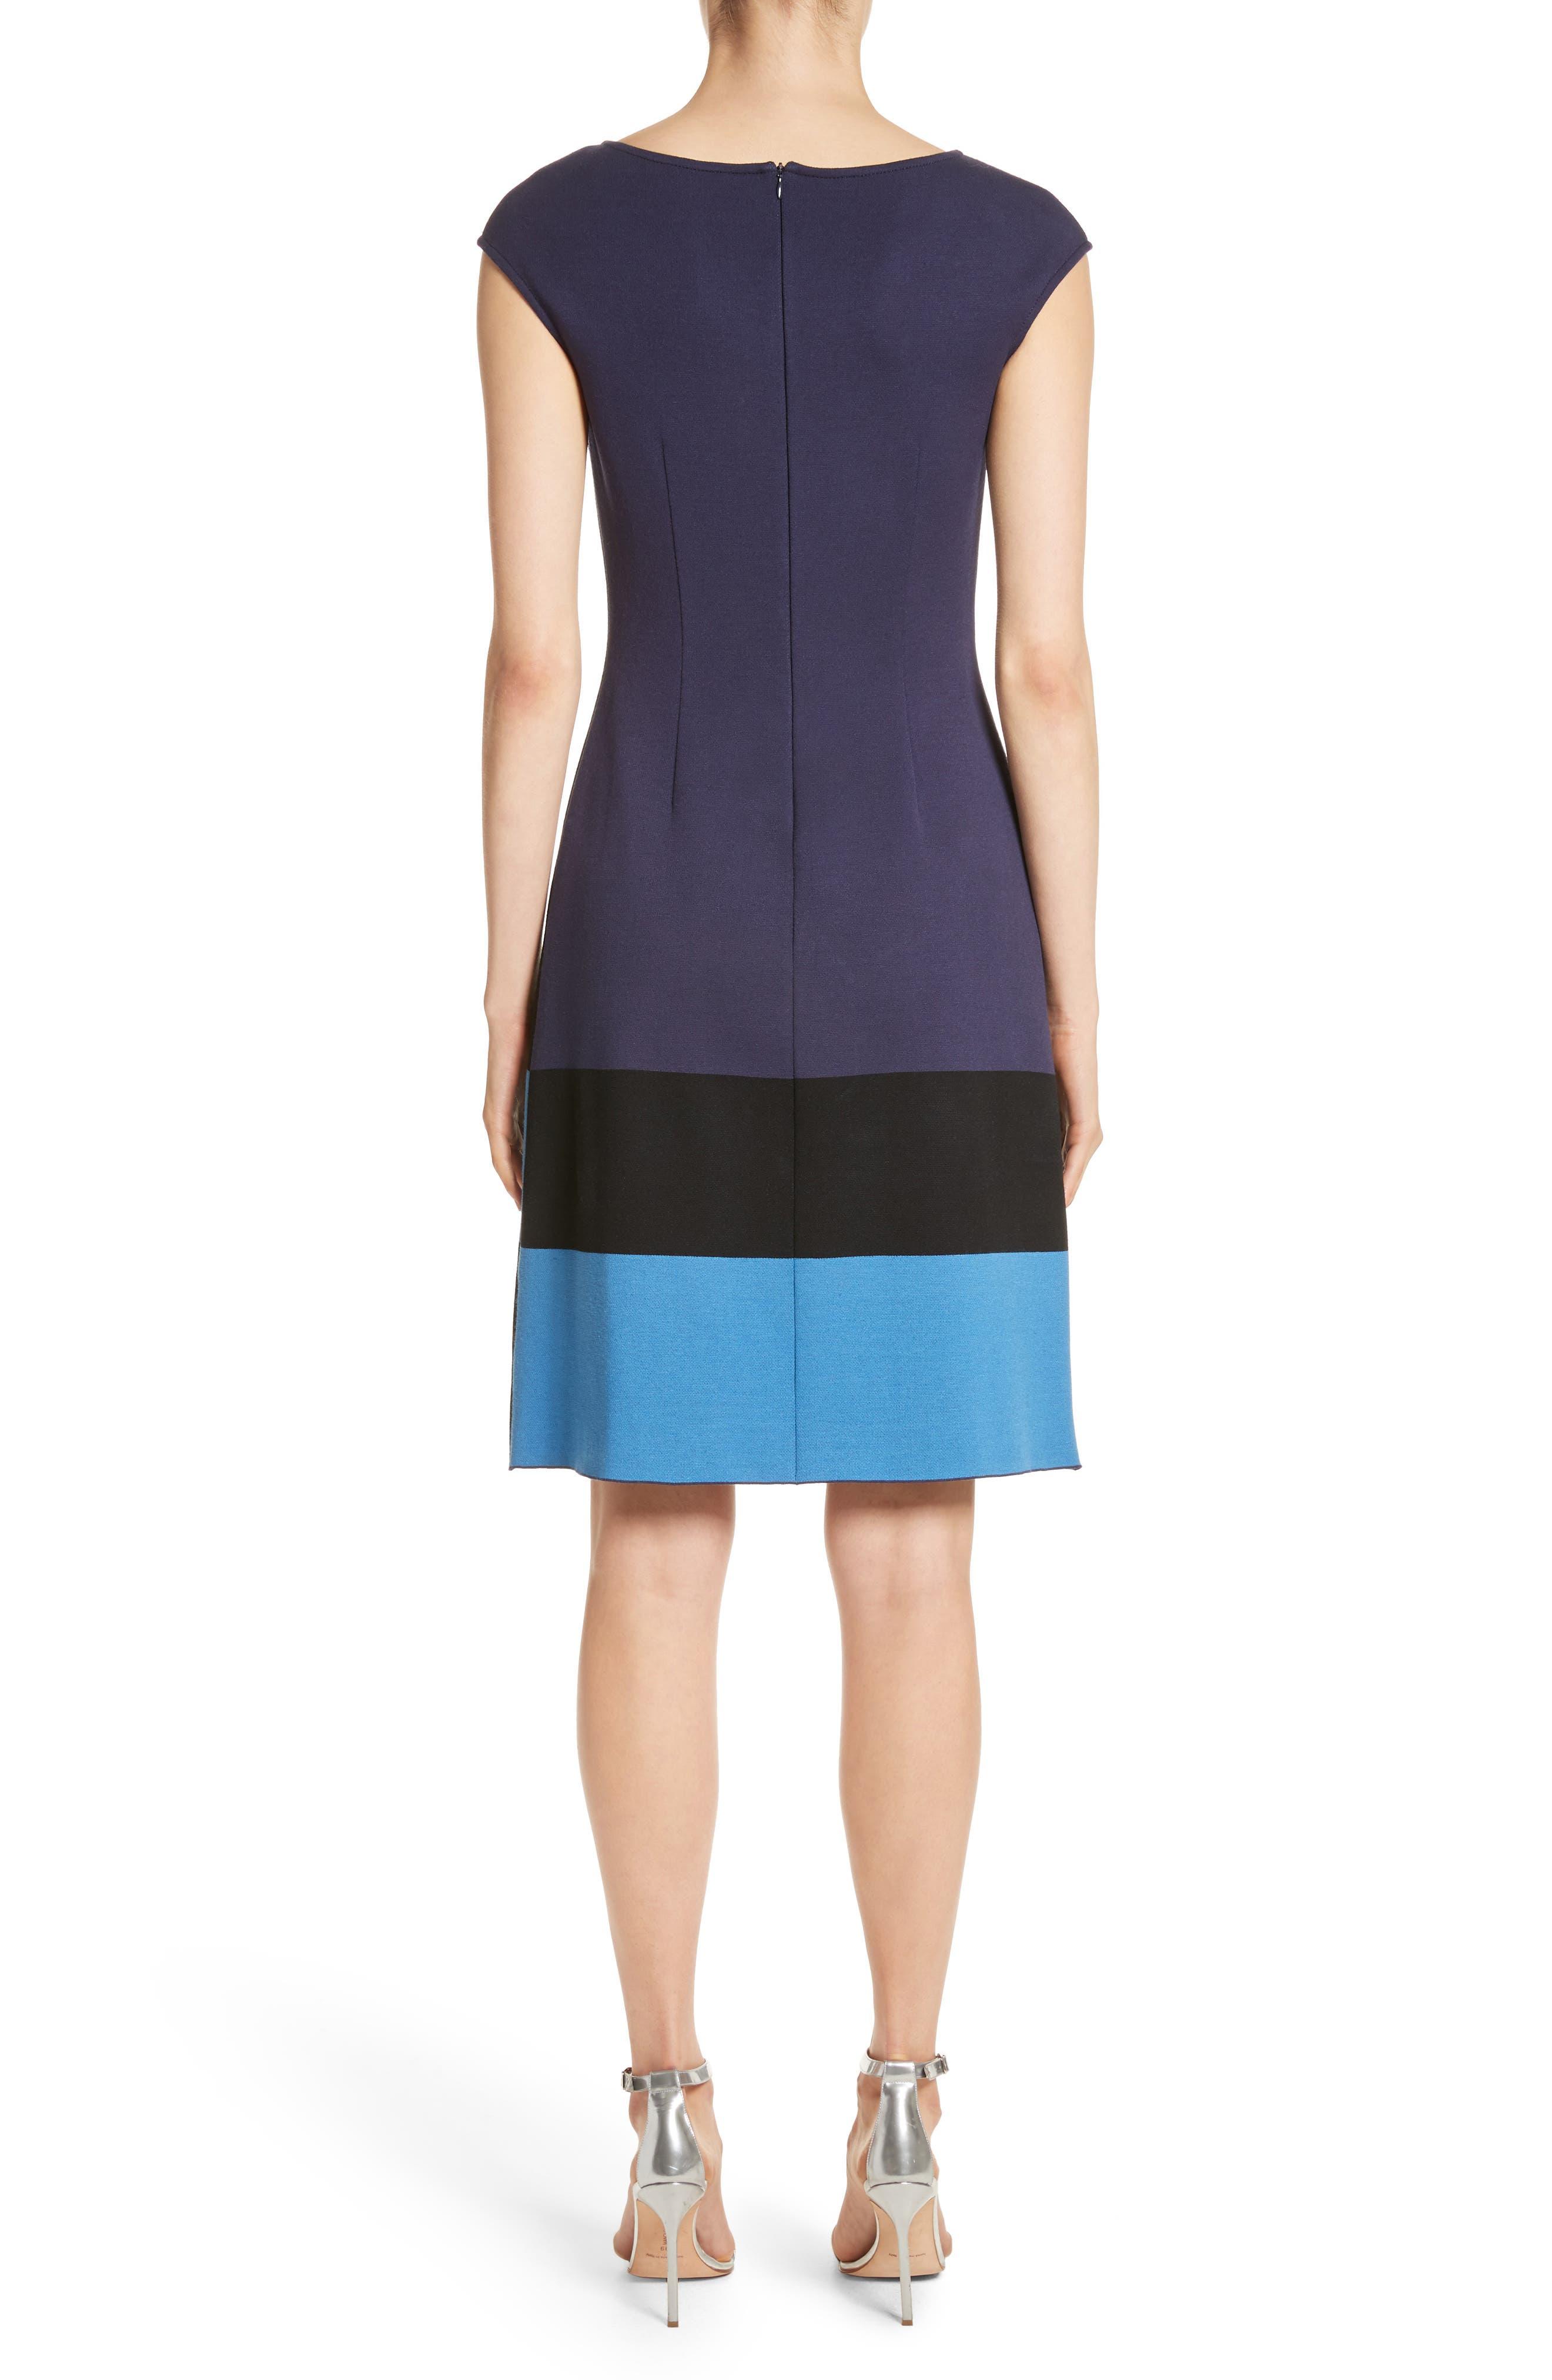 Colorblock Milano Knit Dress,                             Alternate thumbnail 2, color,                             Navy Multi